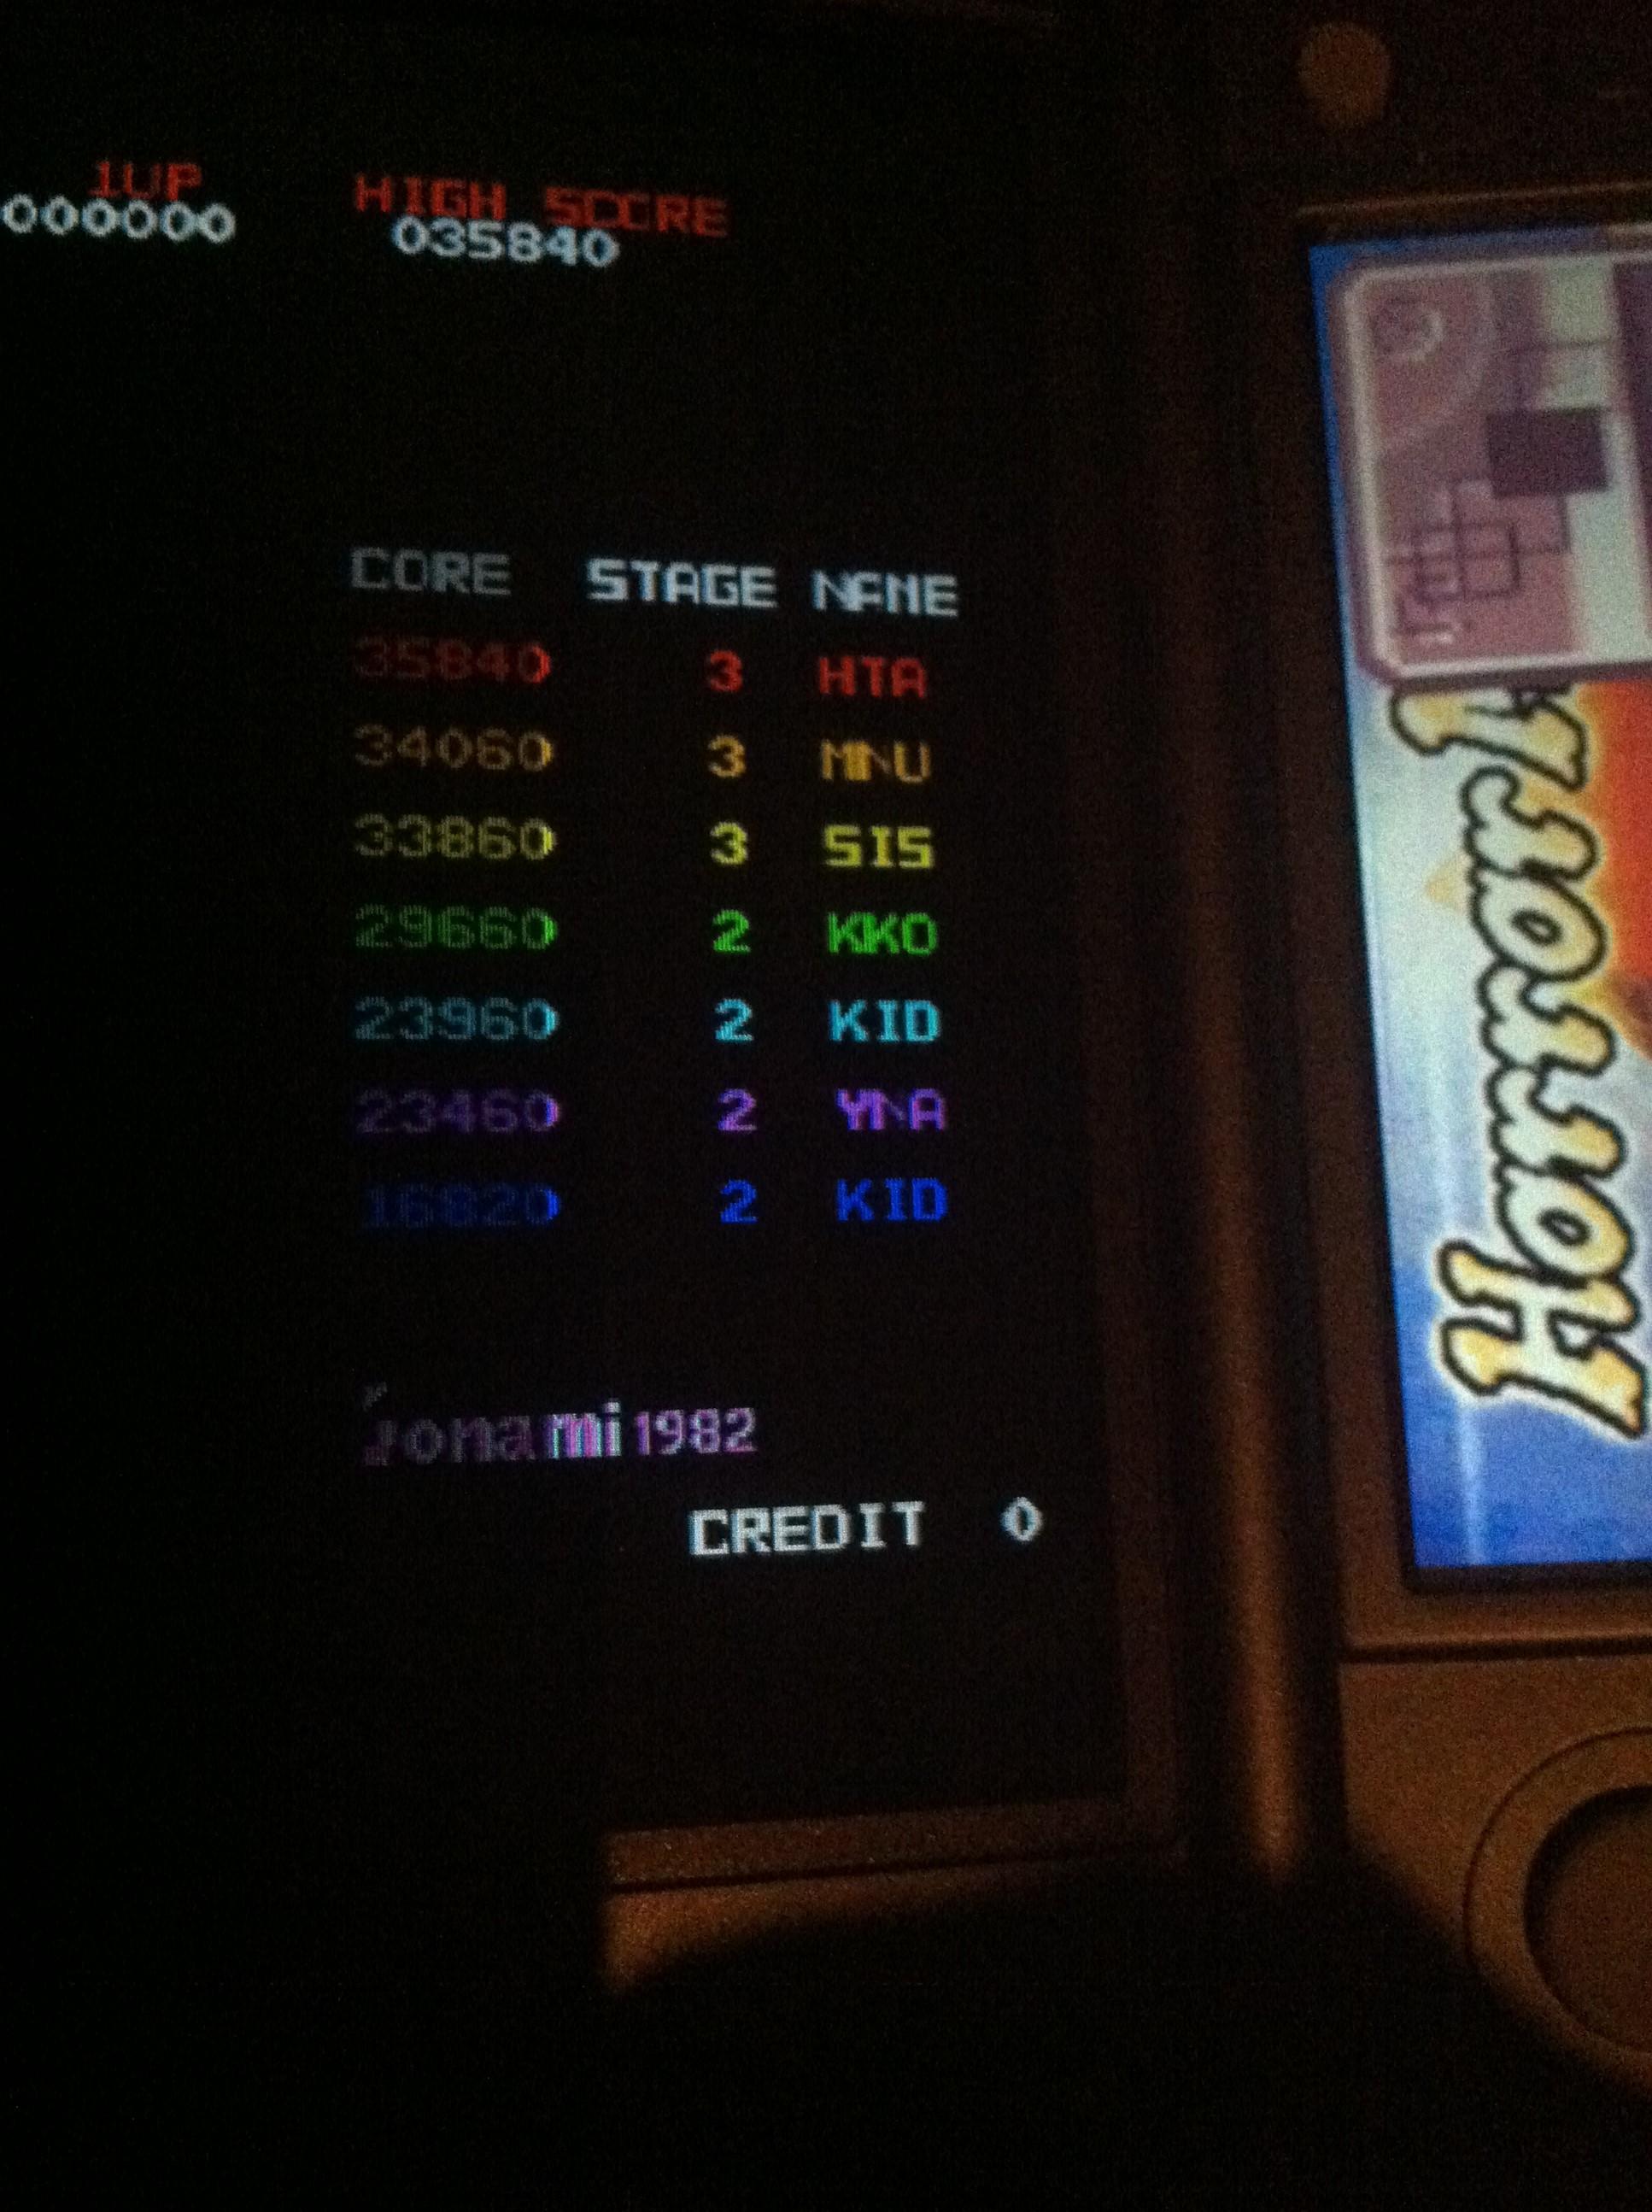 DakotaKid: Konami Classics Series: Arcade Hits: Tutankham / Horror Maze (Nintendo DS) 23,960 points on 2017-09-13 20:04:06